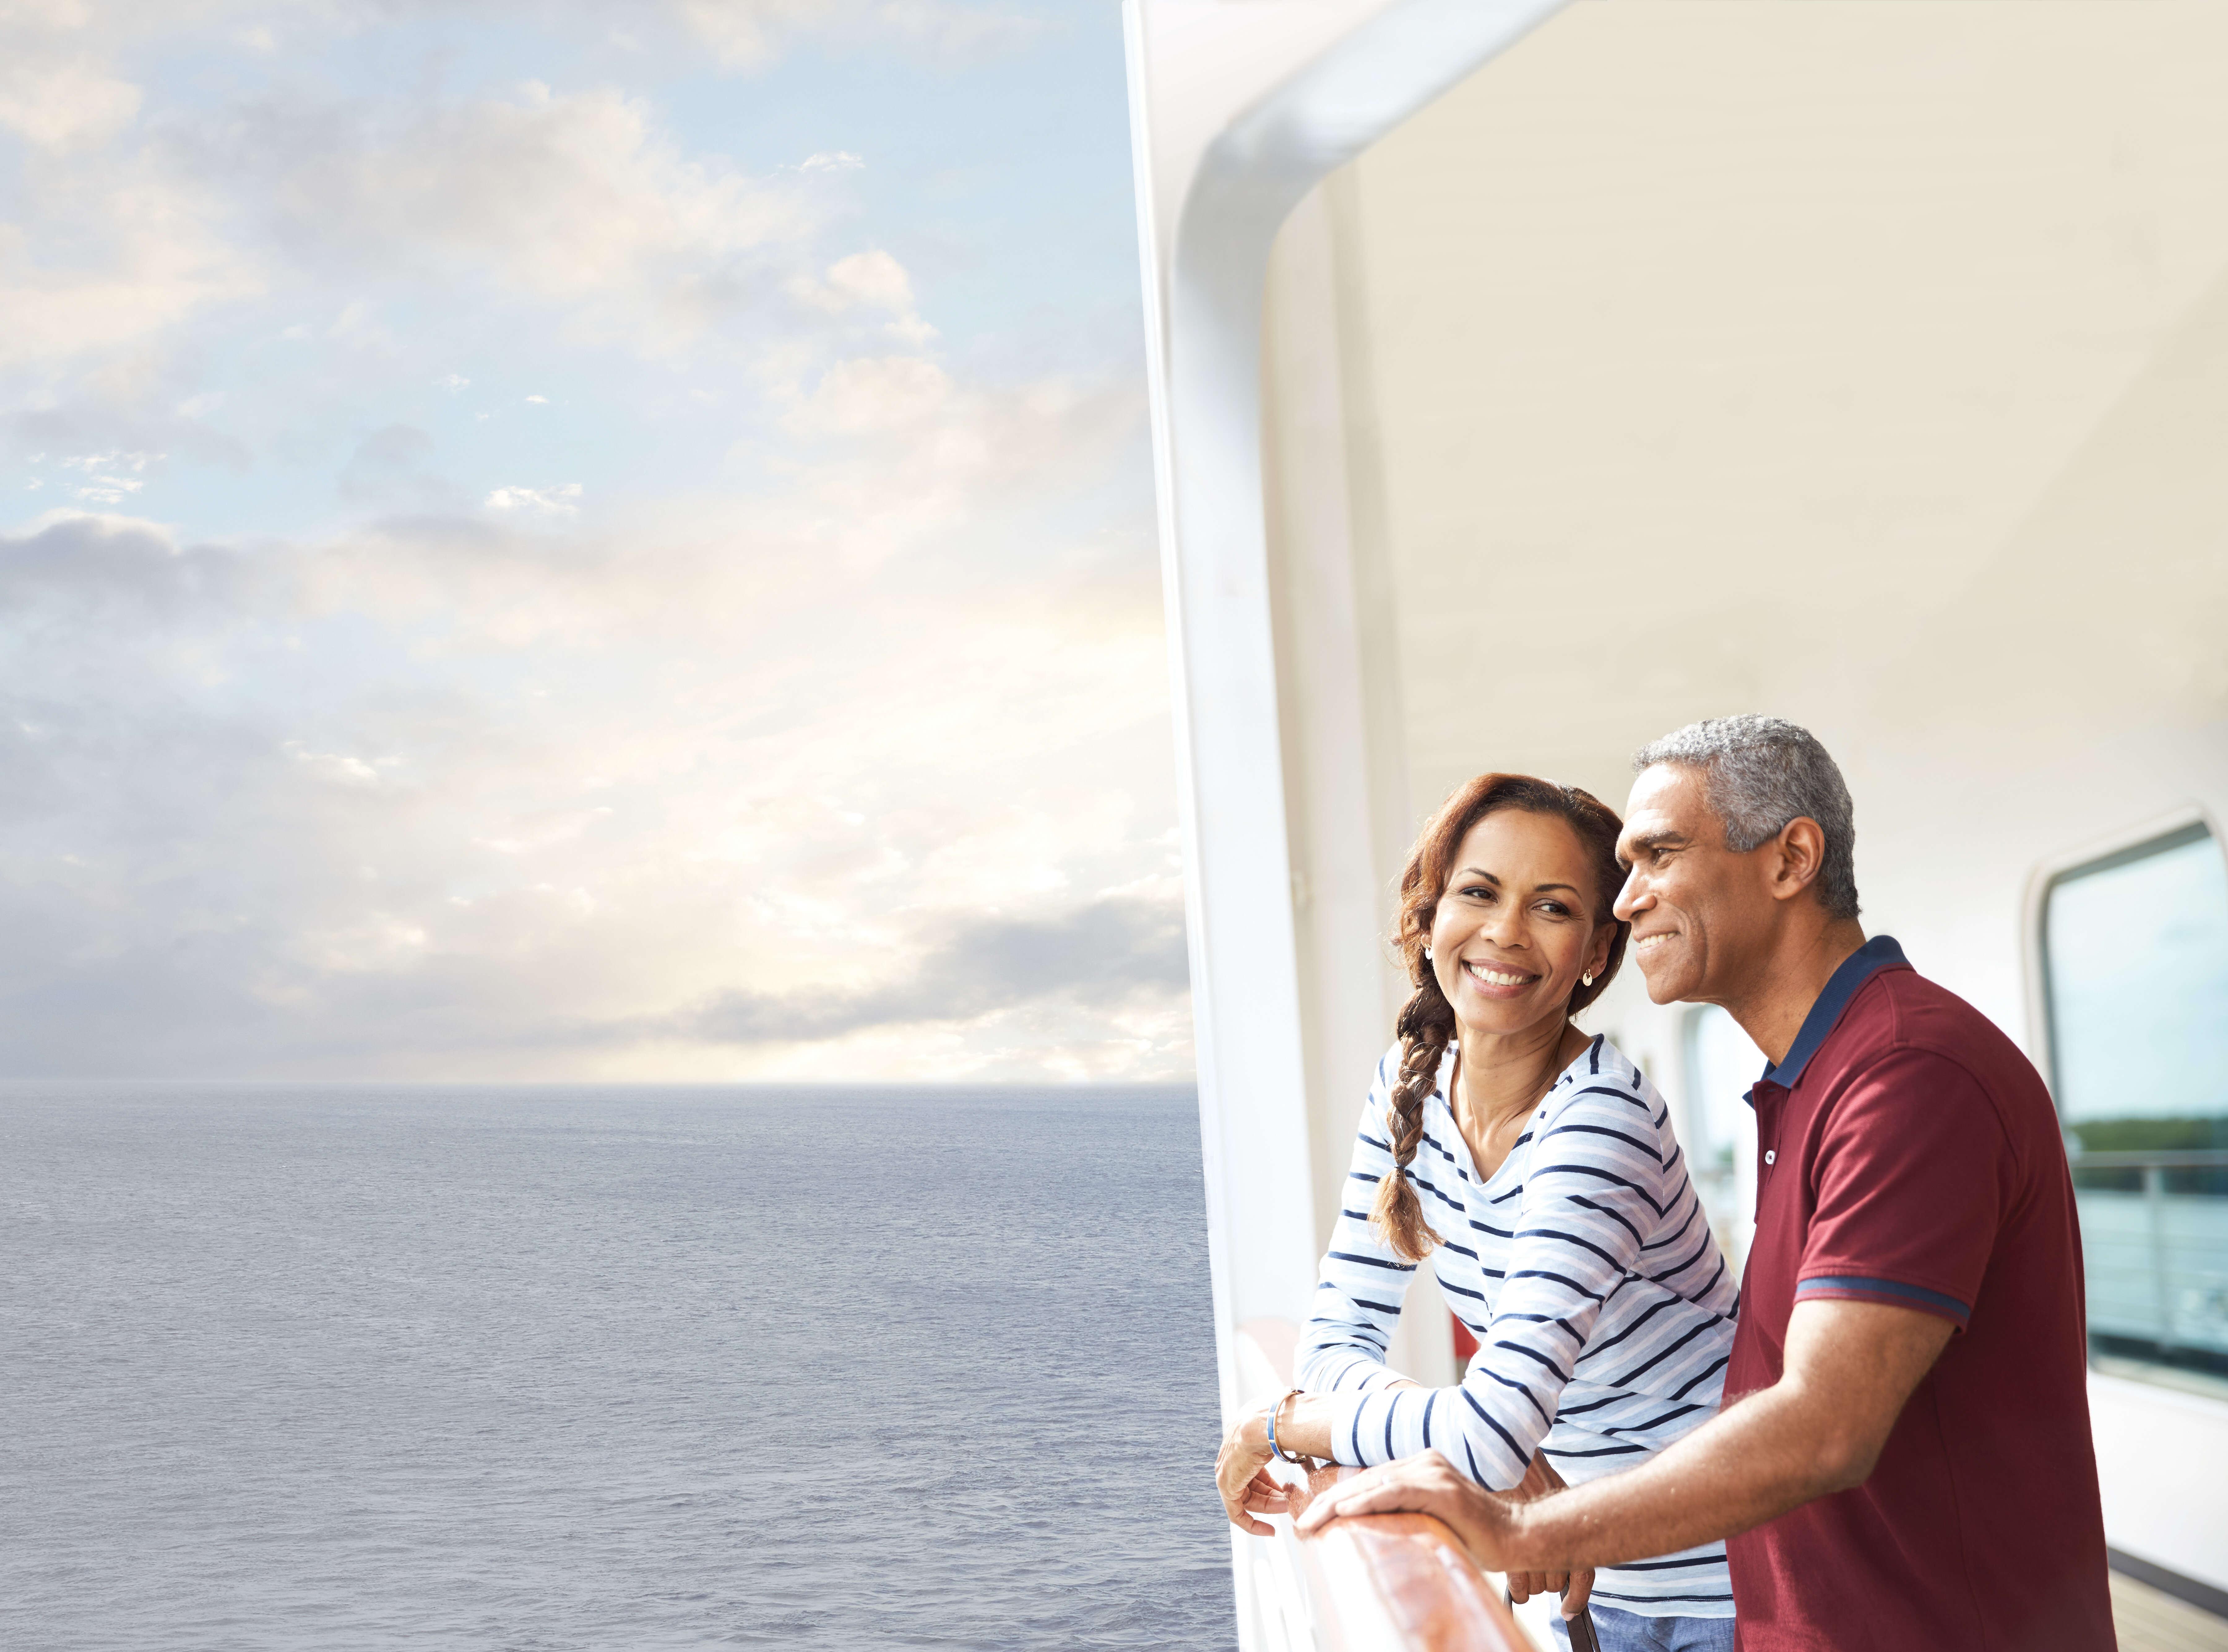 Receive Prepaid Gratuities, Onboard Spending Money and More!